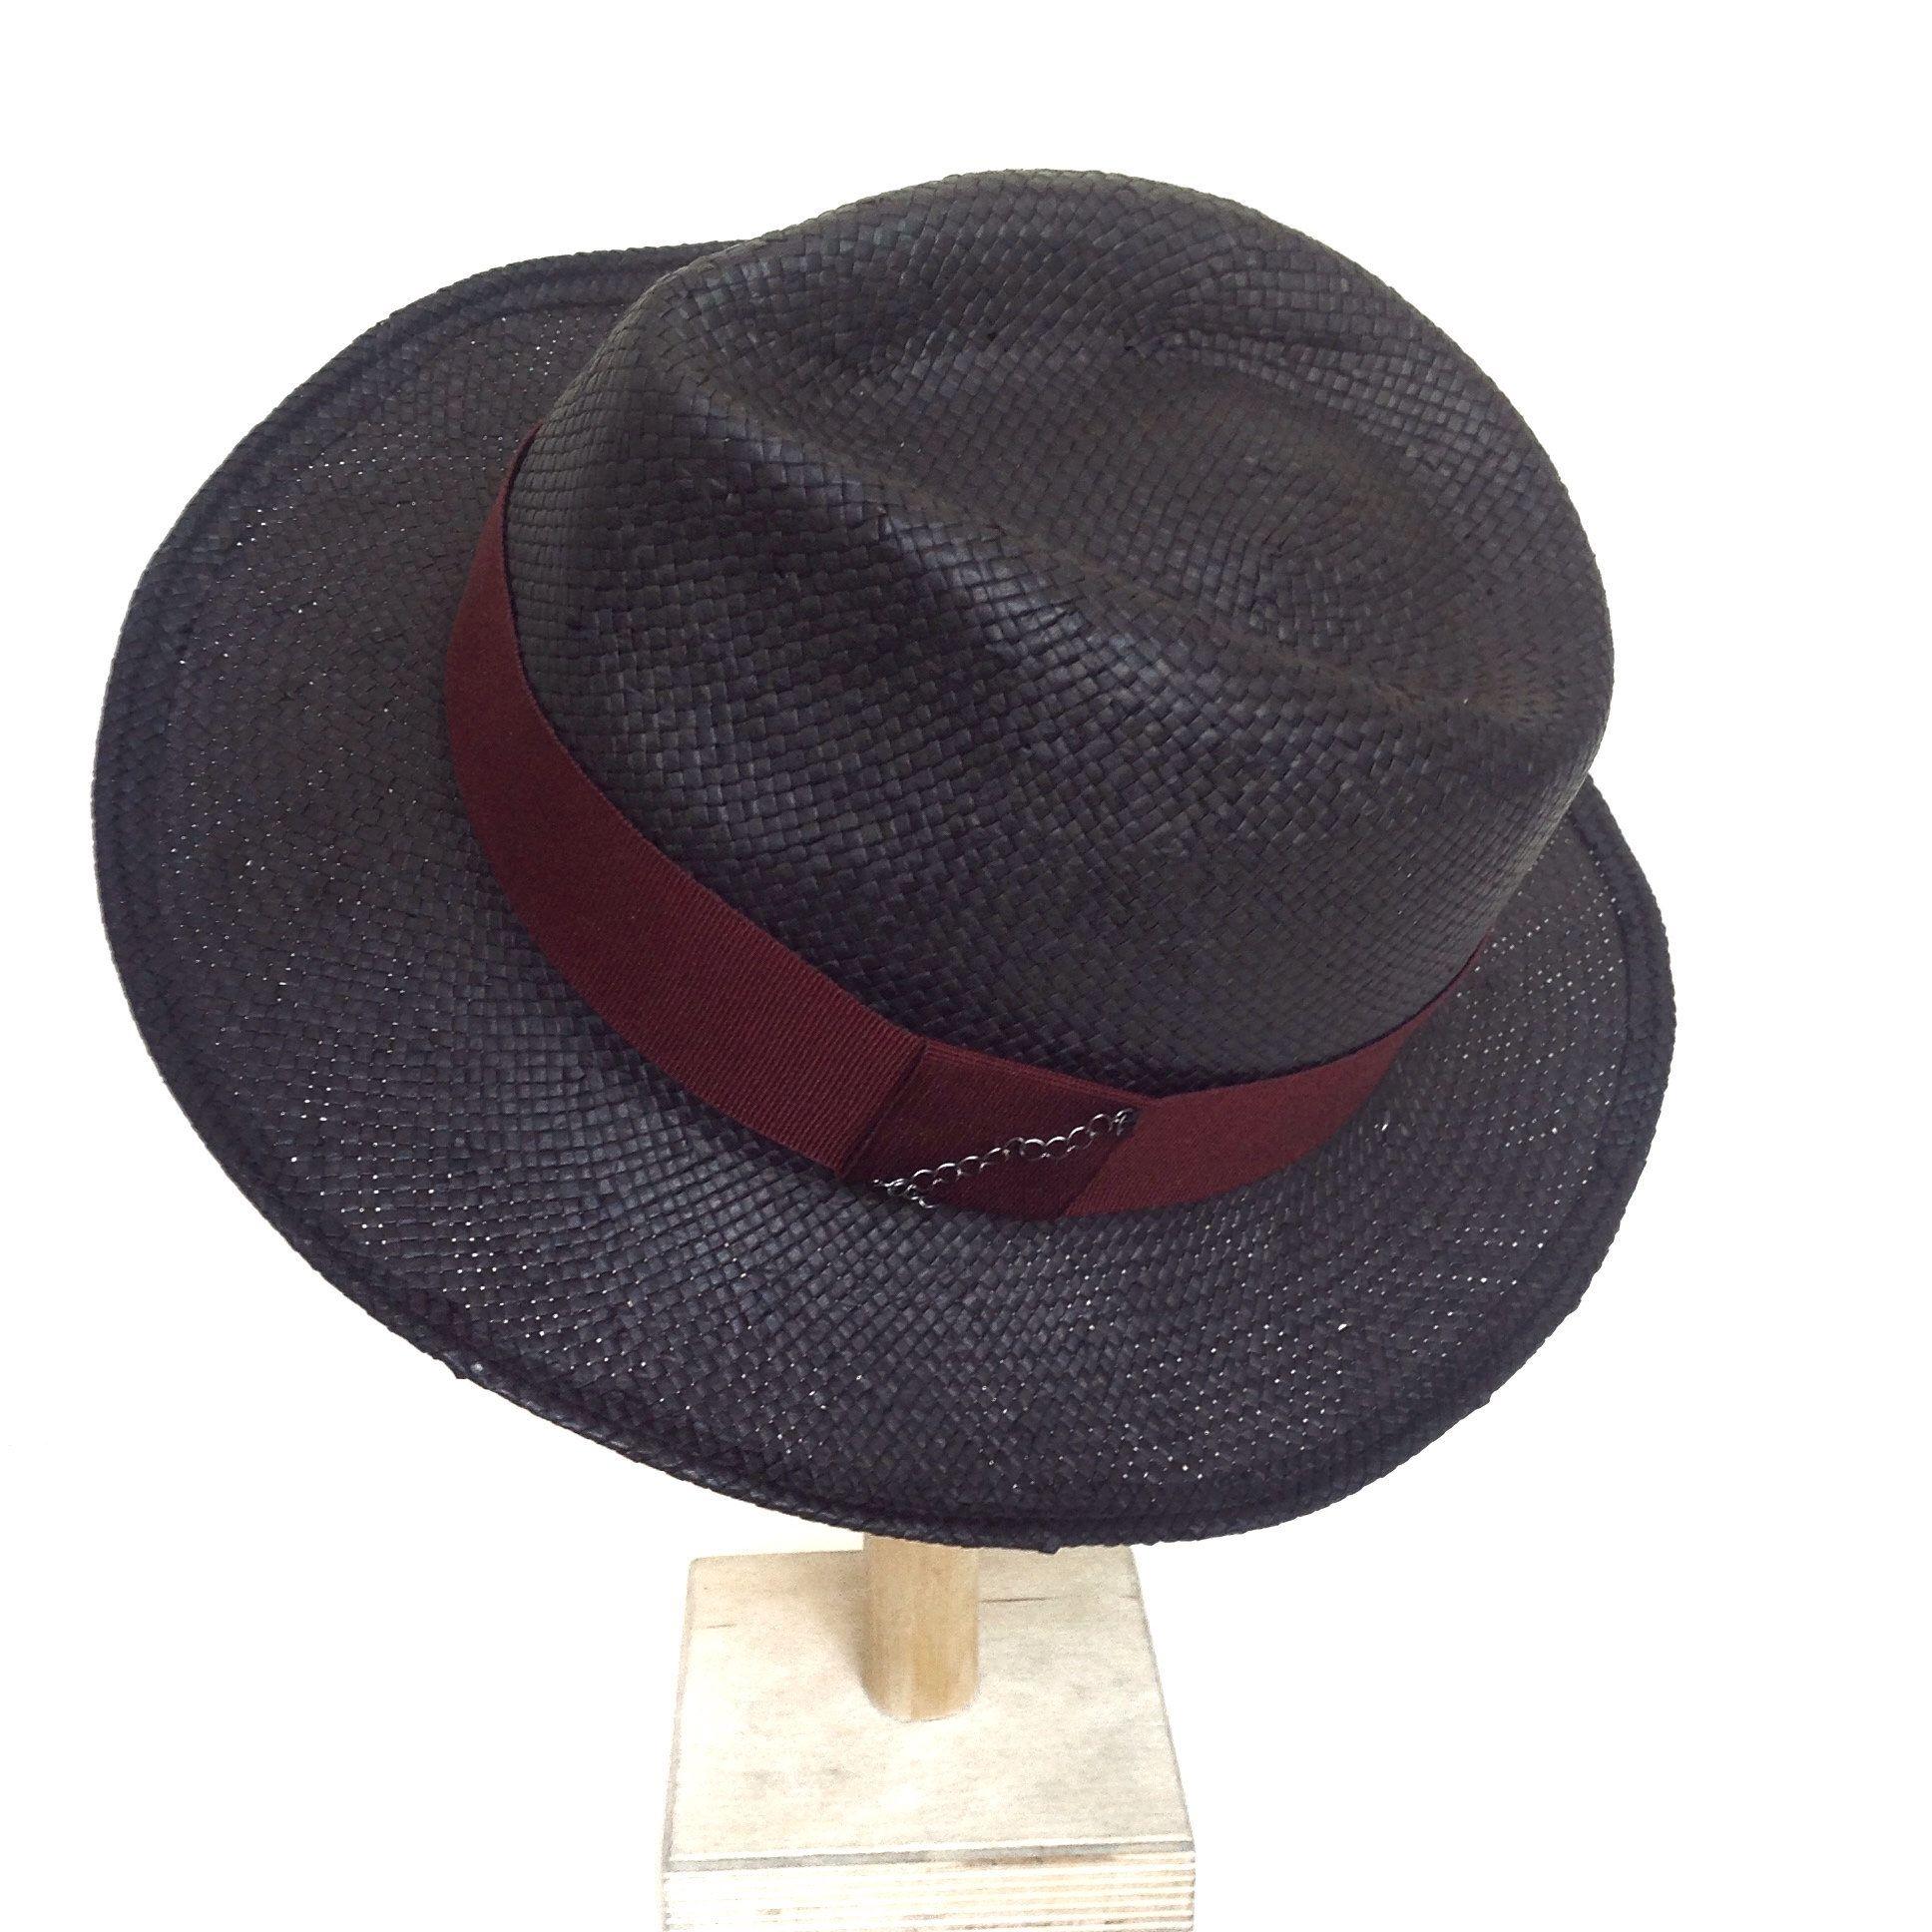 ... Un Sogno In Testa. S etsy  Mens fedora hat. Black straw trilby gift for  dad. Panama bdc97ef3e0f1